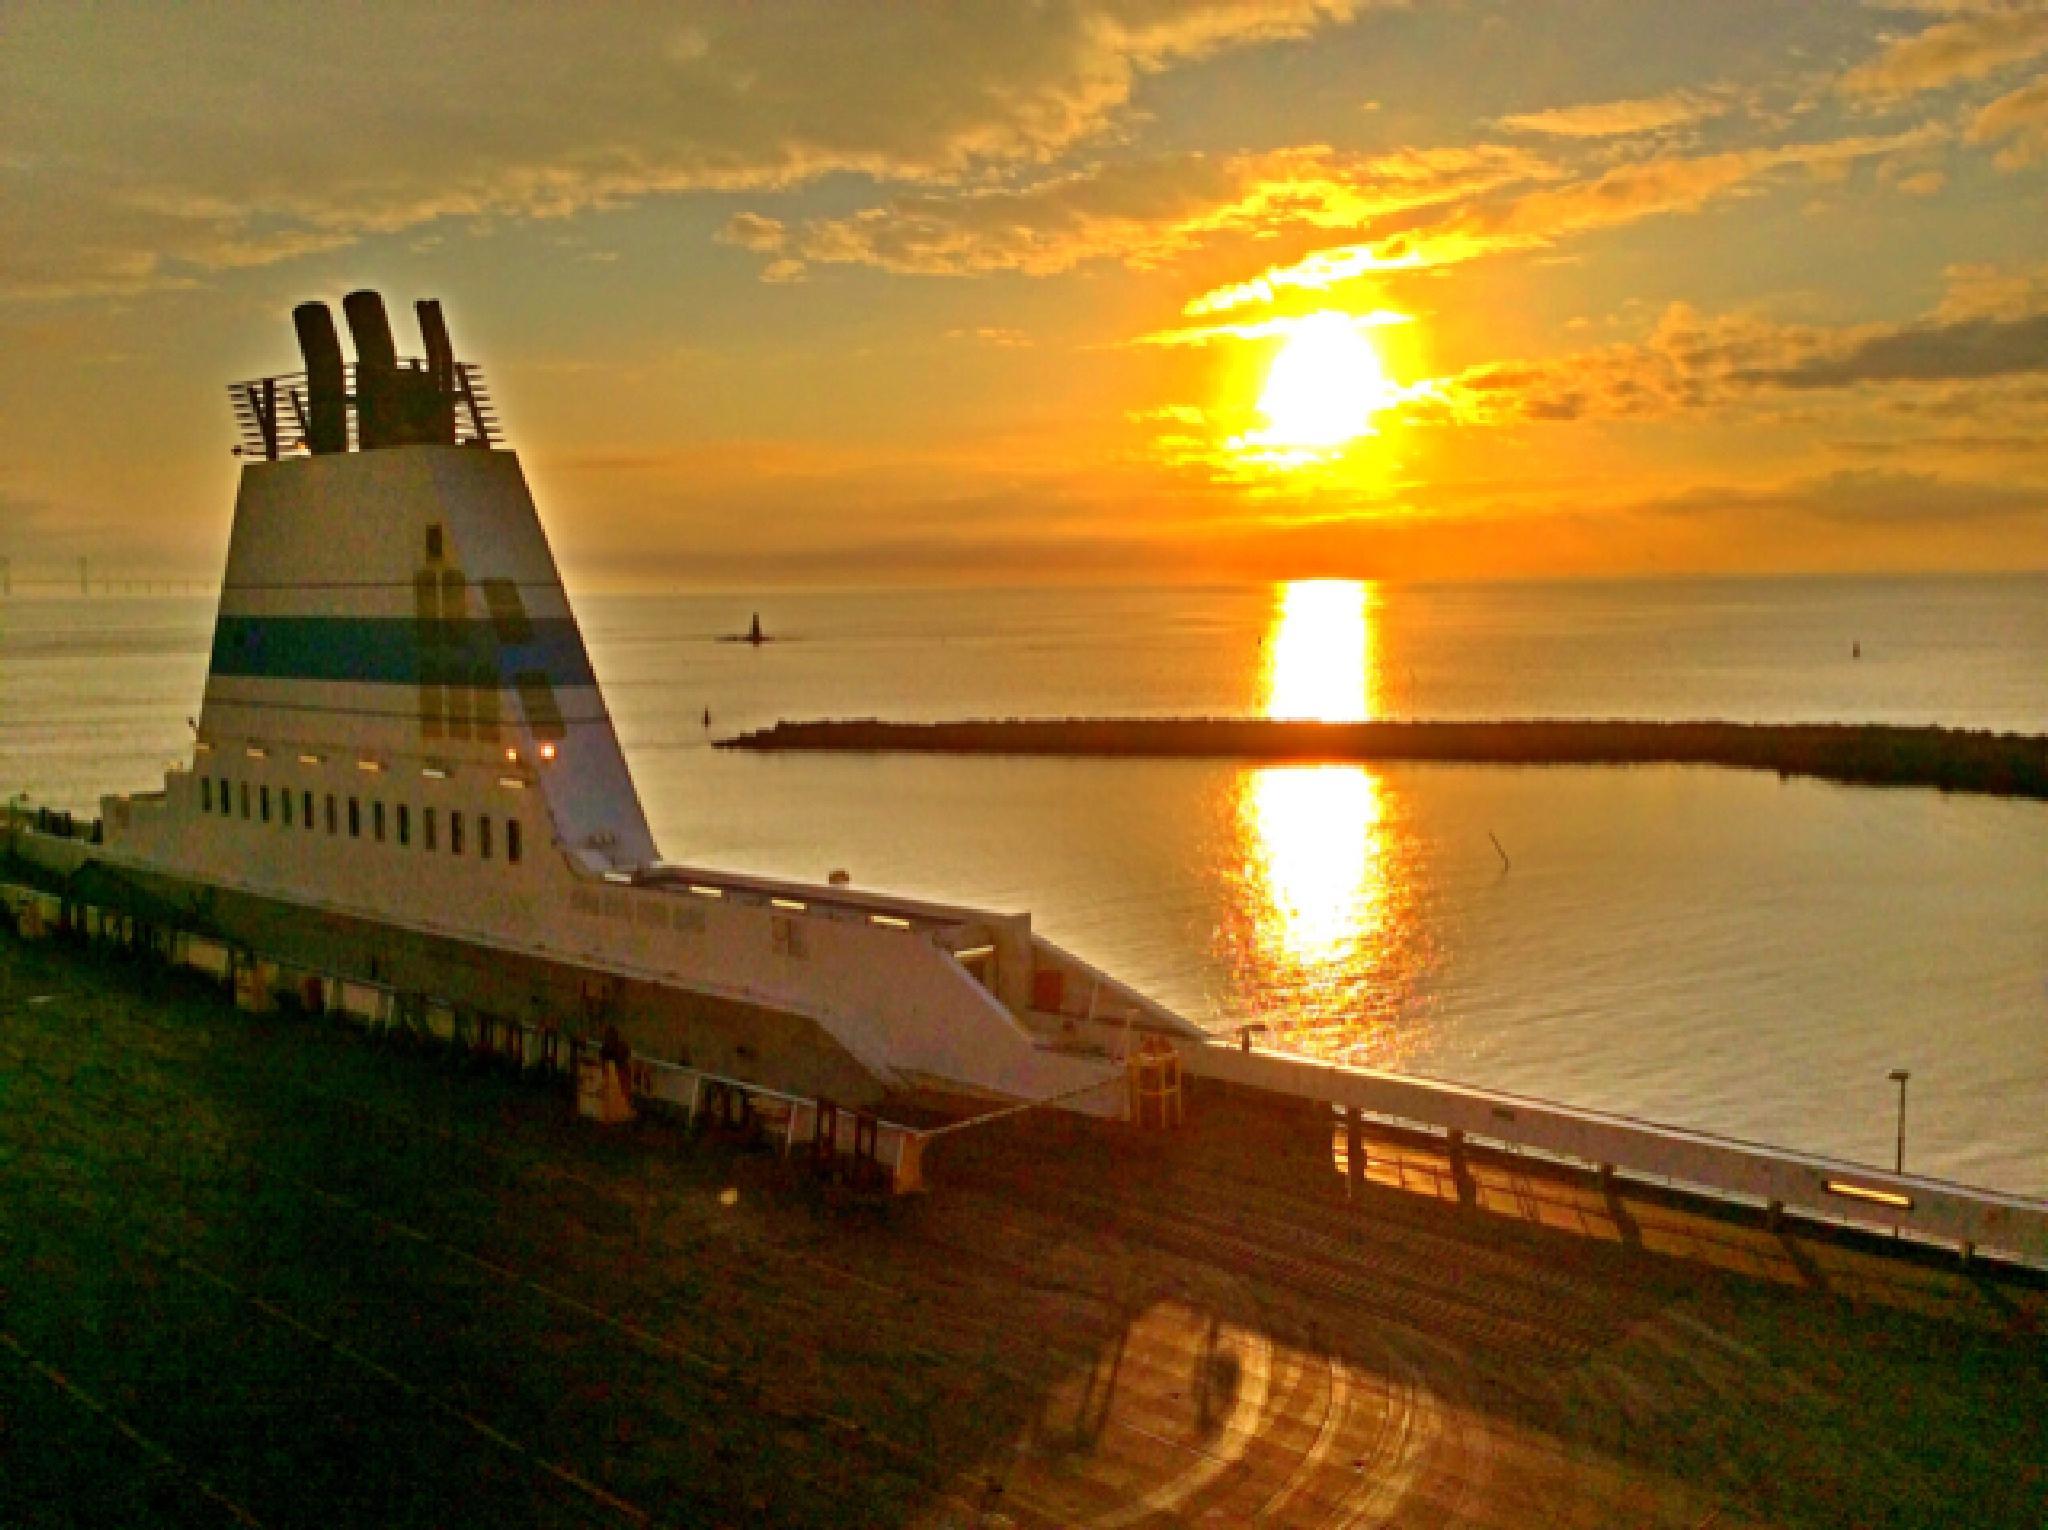 Glowing Sunset by Johan Meding